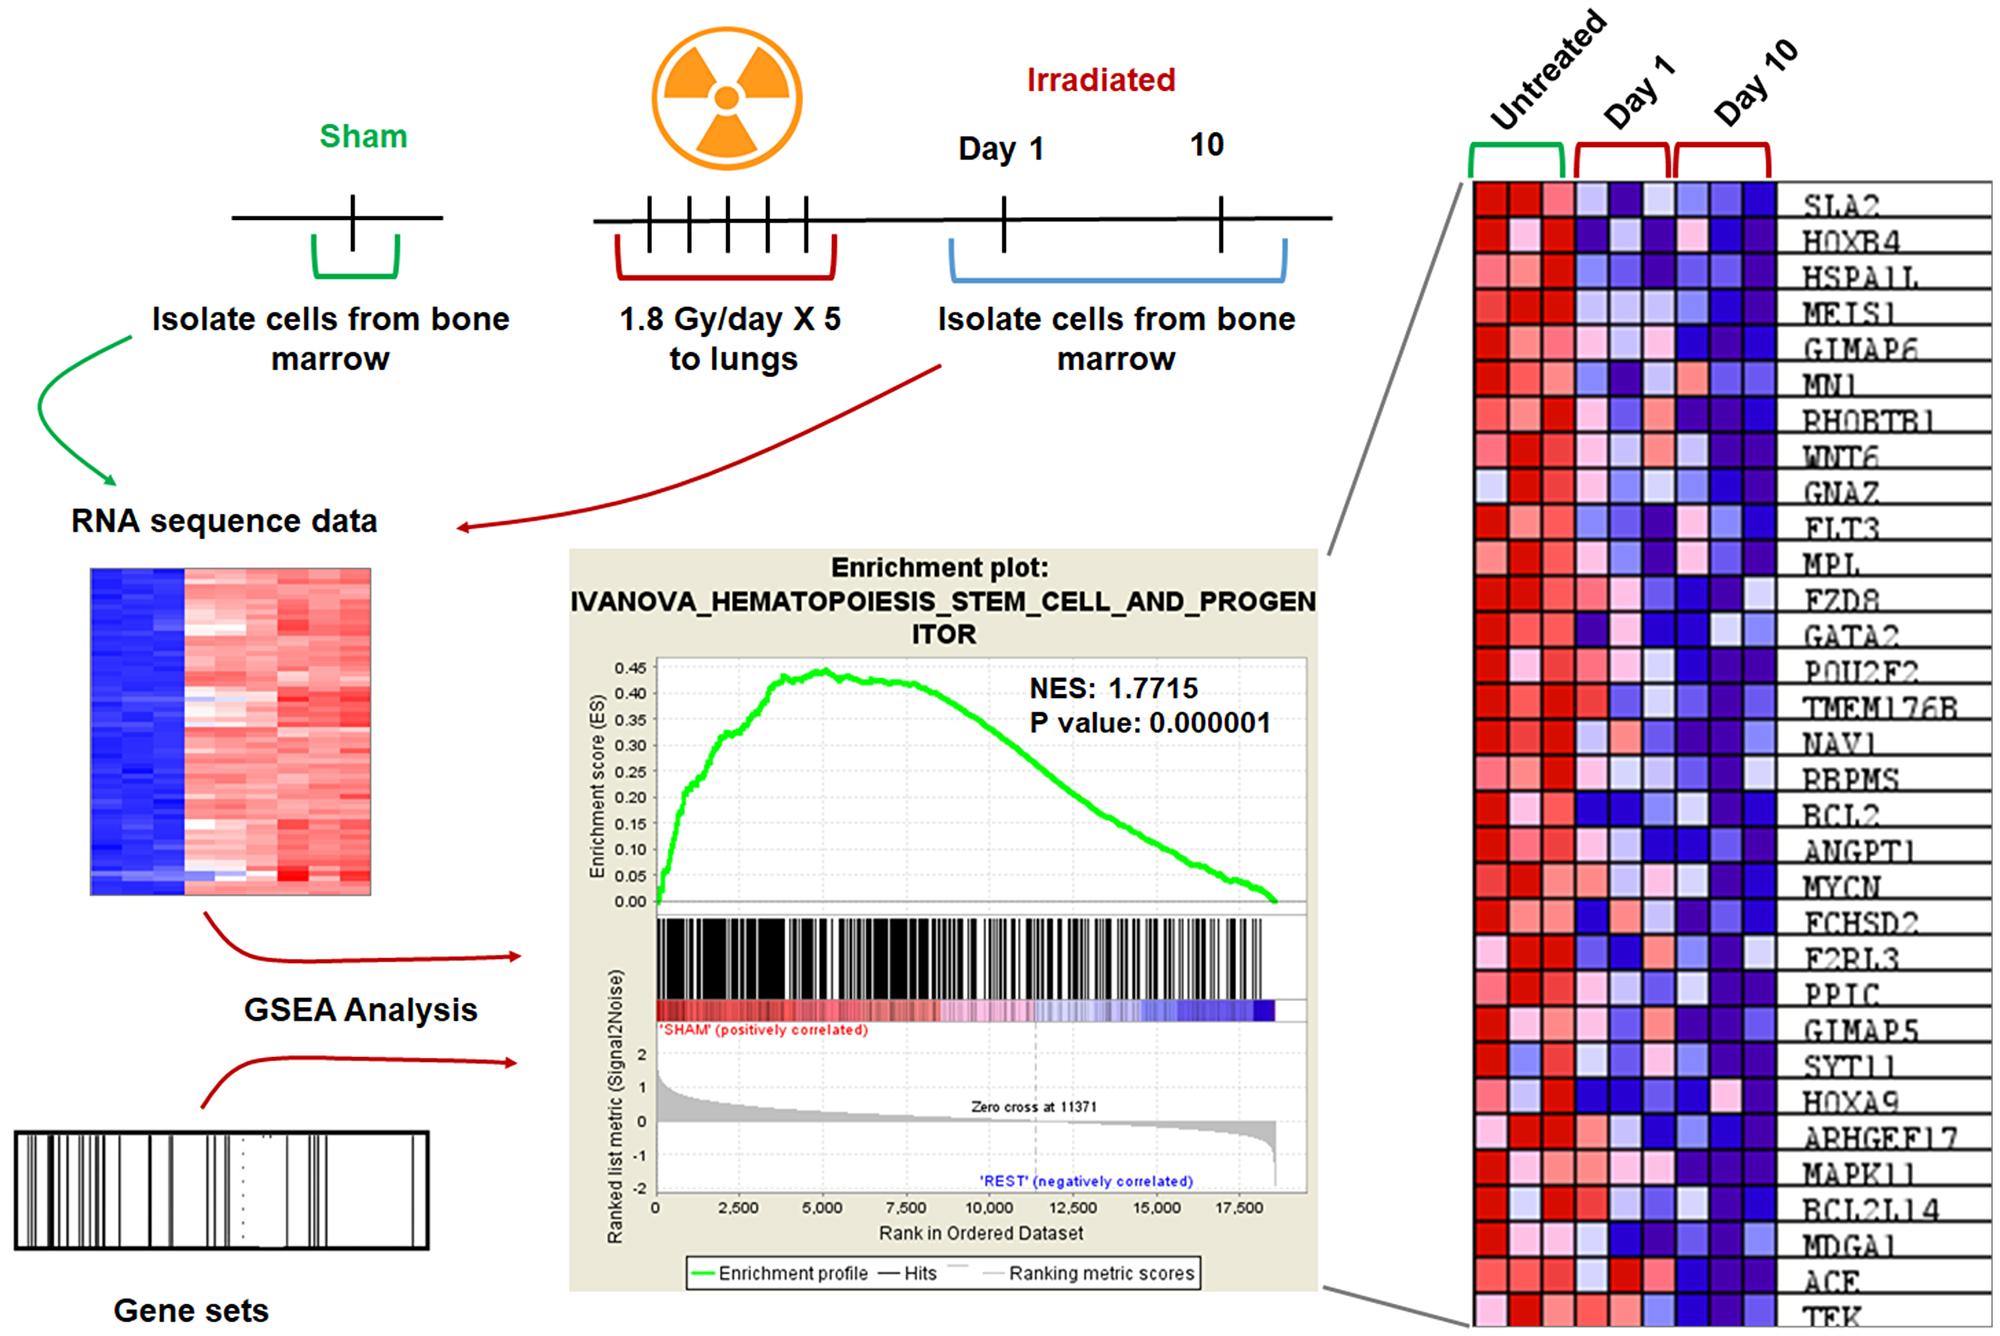 GSEA analysis revealed downregulation of genes involved in hematopoiesis.